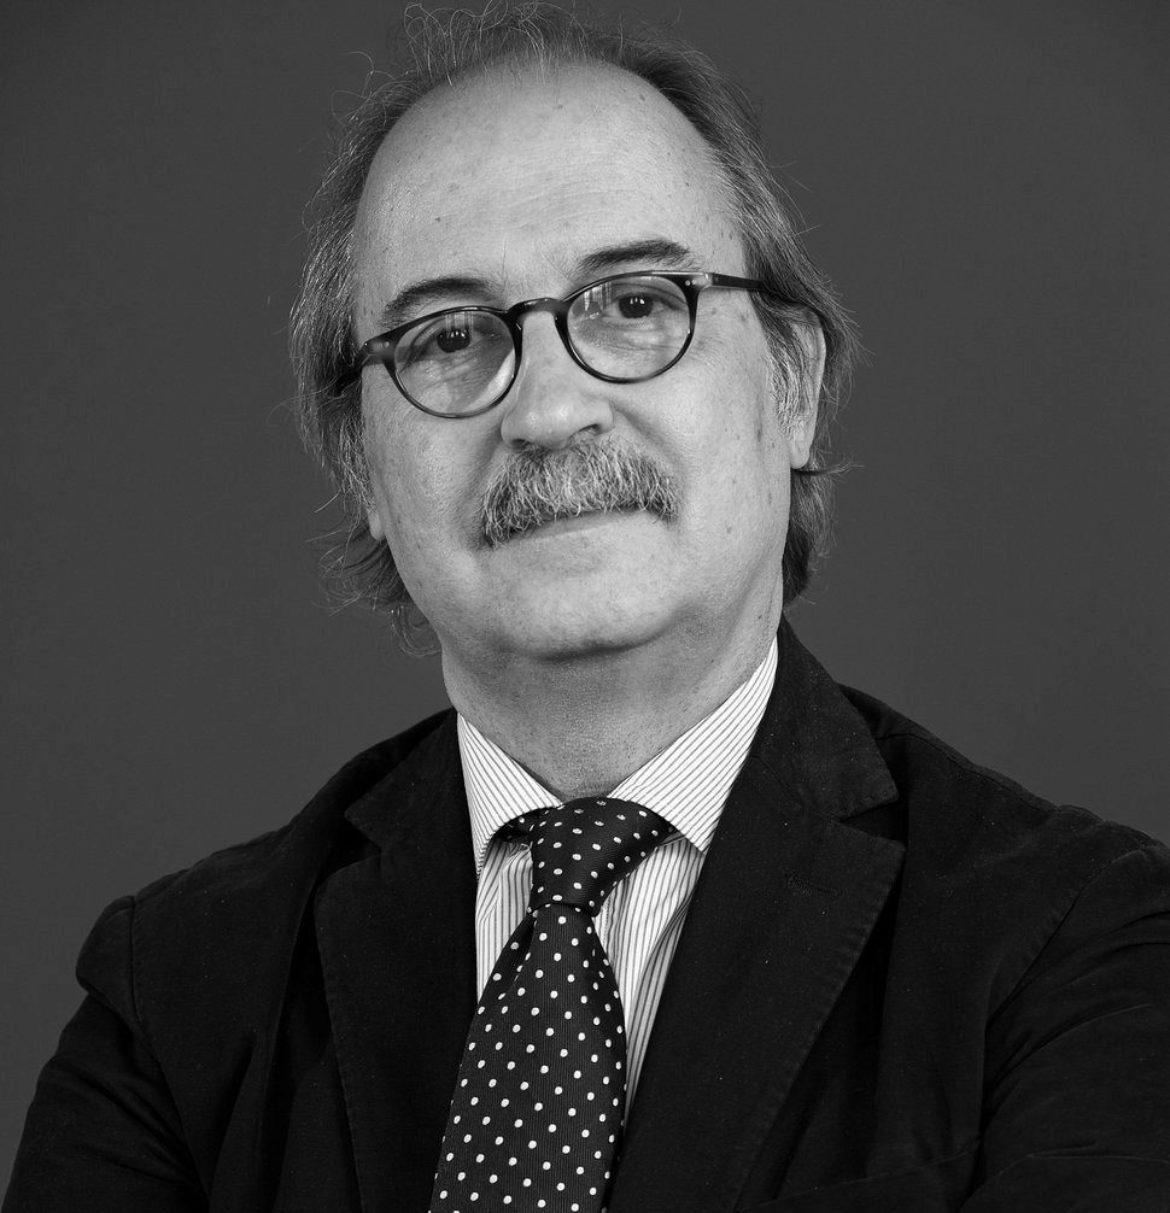 Antonio Bernal Pérez-Herrera